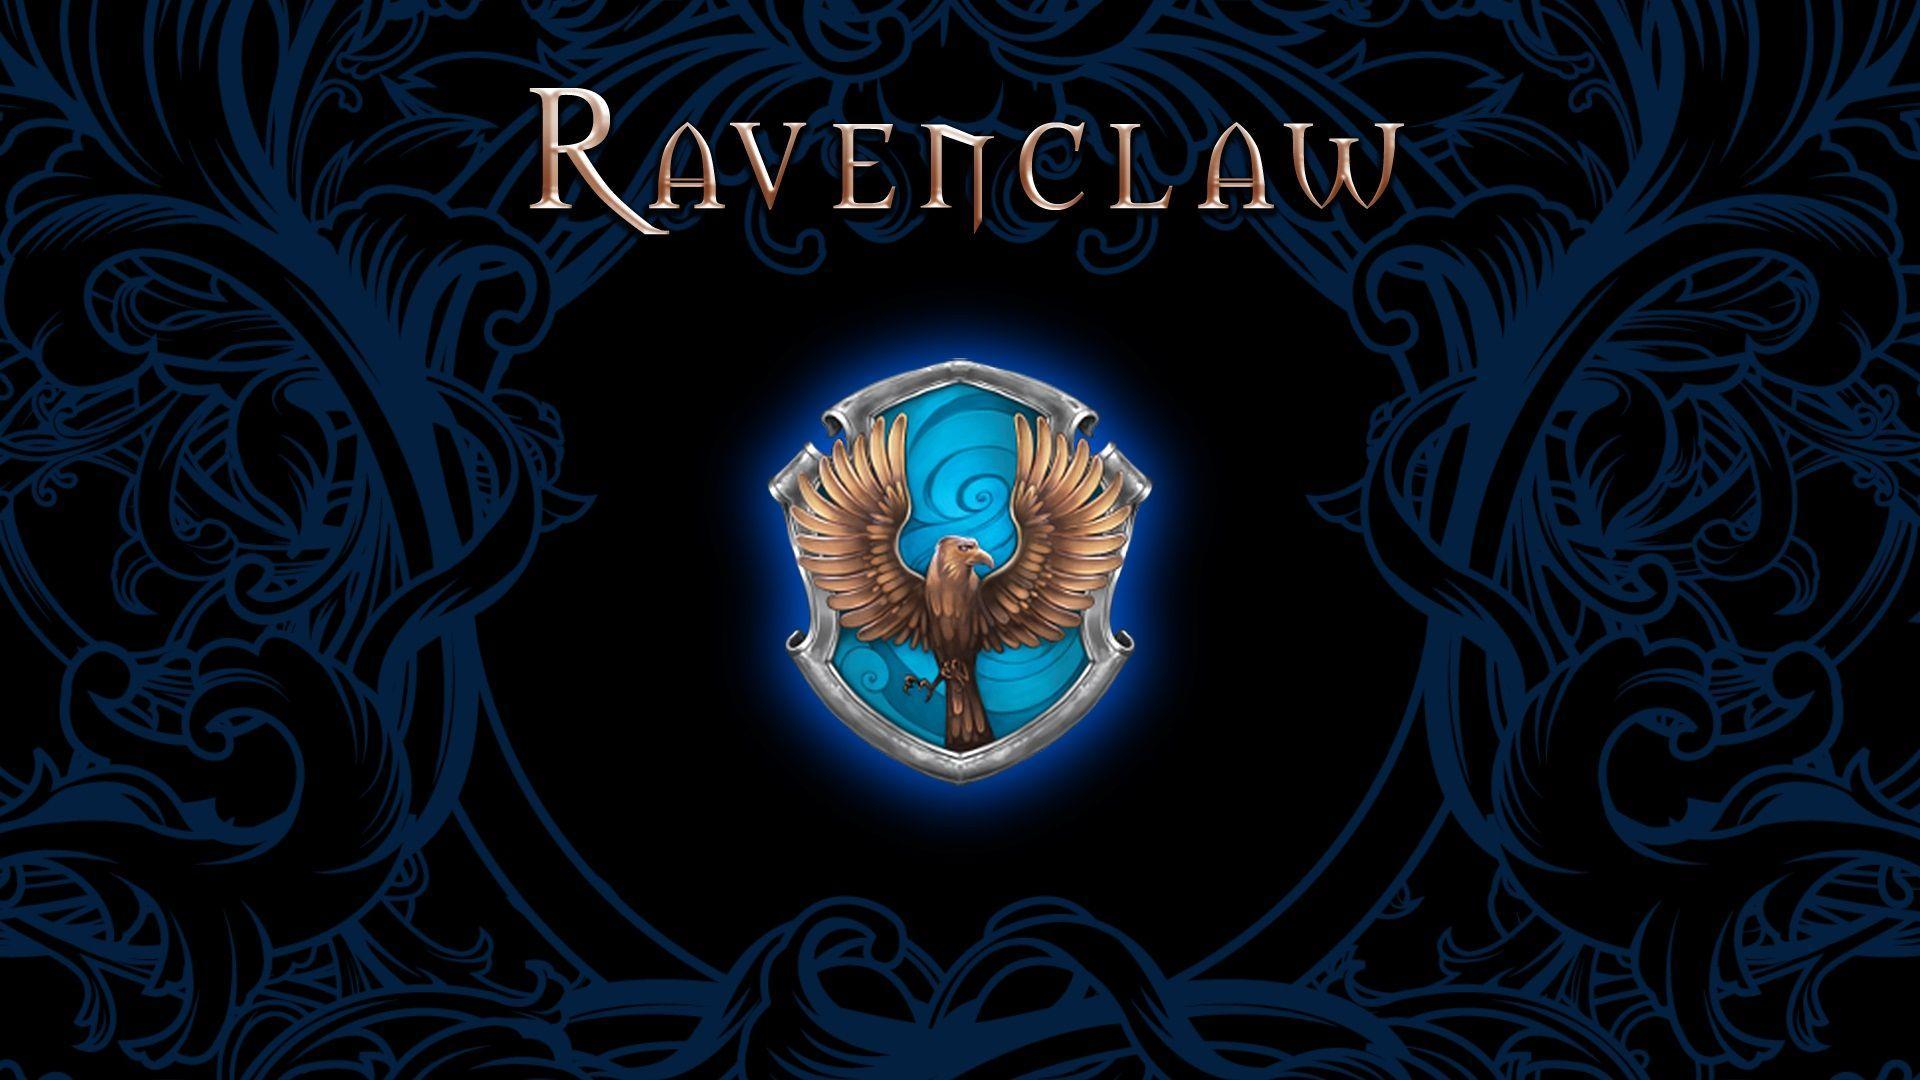 750x1334 Best Background Ever E2 9a A1 Harry Potter E2 9a A1 Pinterest Harry